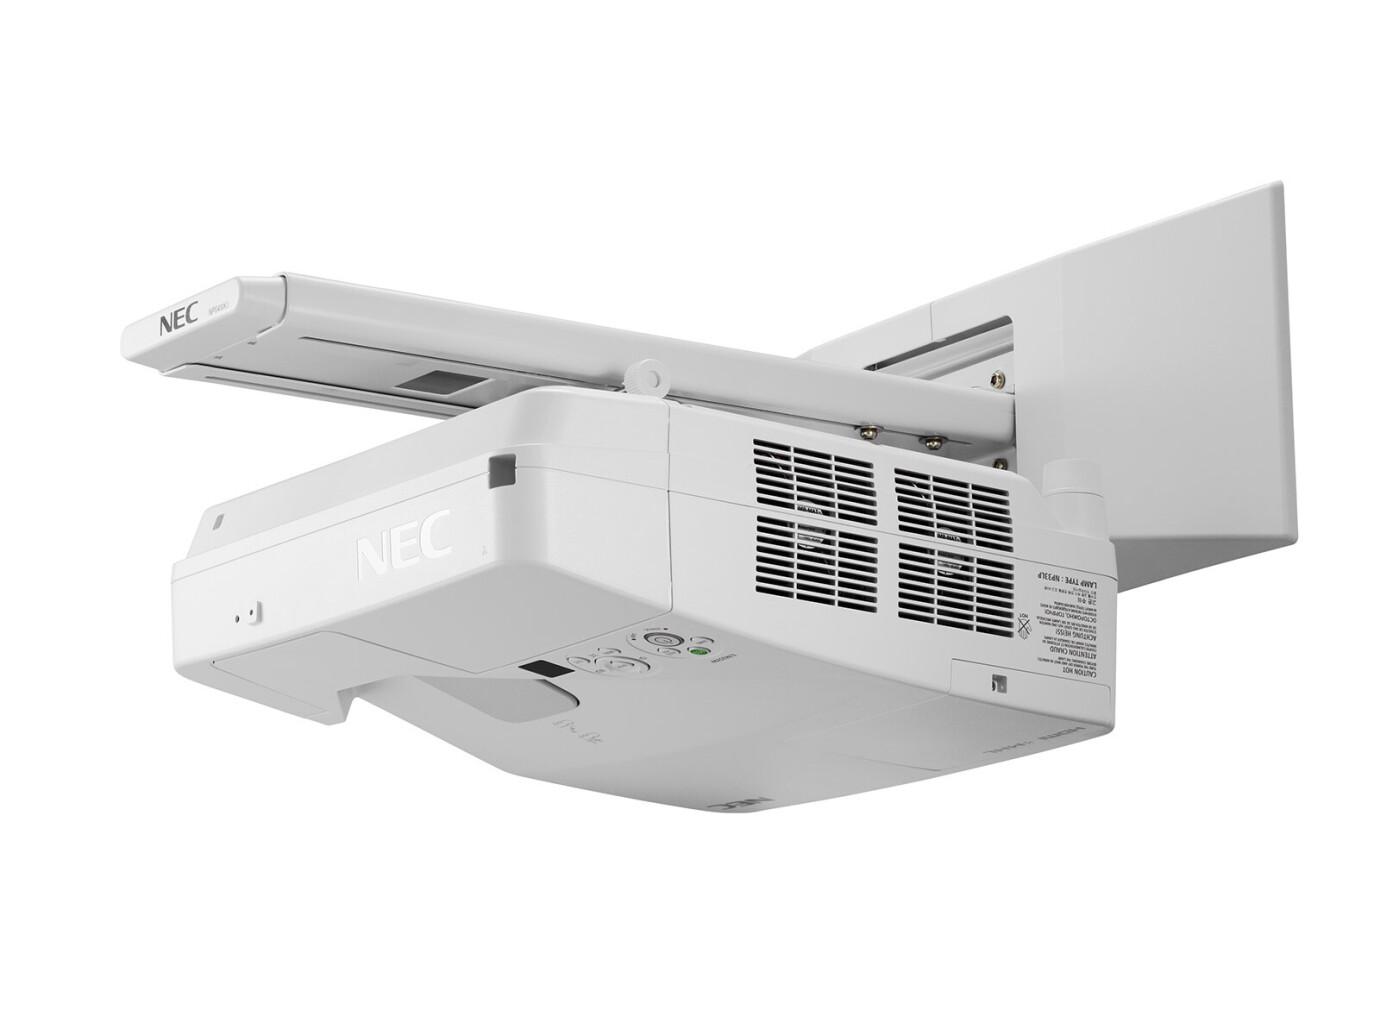 NEC UM361X inkl. Wandhalterung Kurzdistanzbeamer, 3600 ANSI-Lumen, XGA